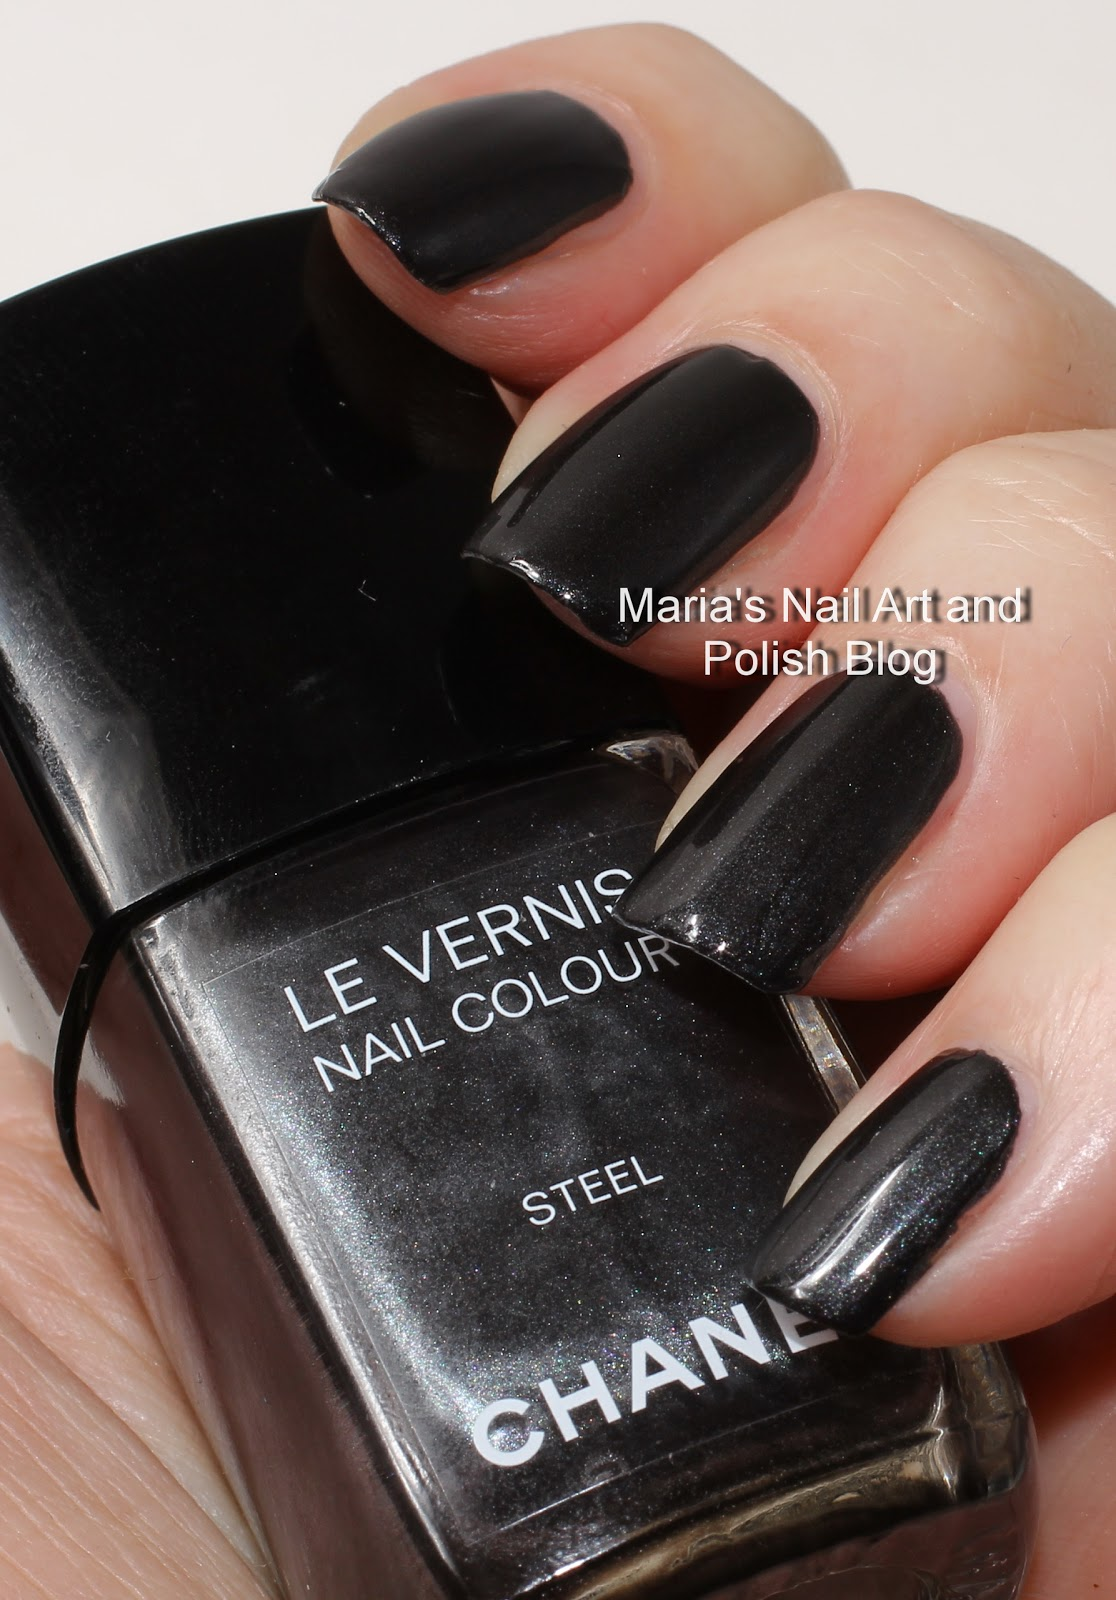 Marias Nail Art And Polish Blog Chanel Steel Soho Story Collection